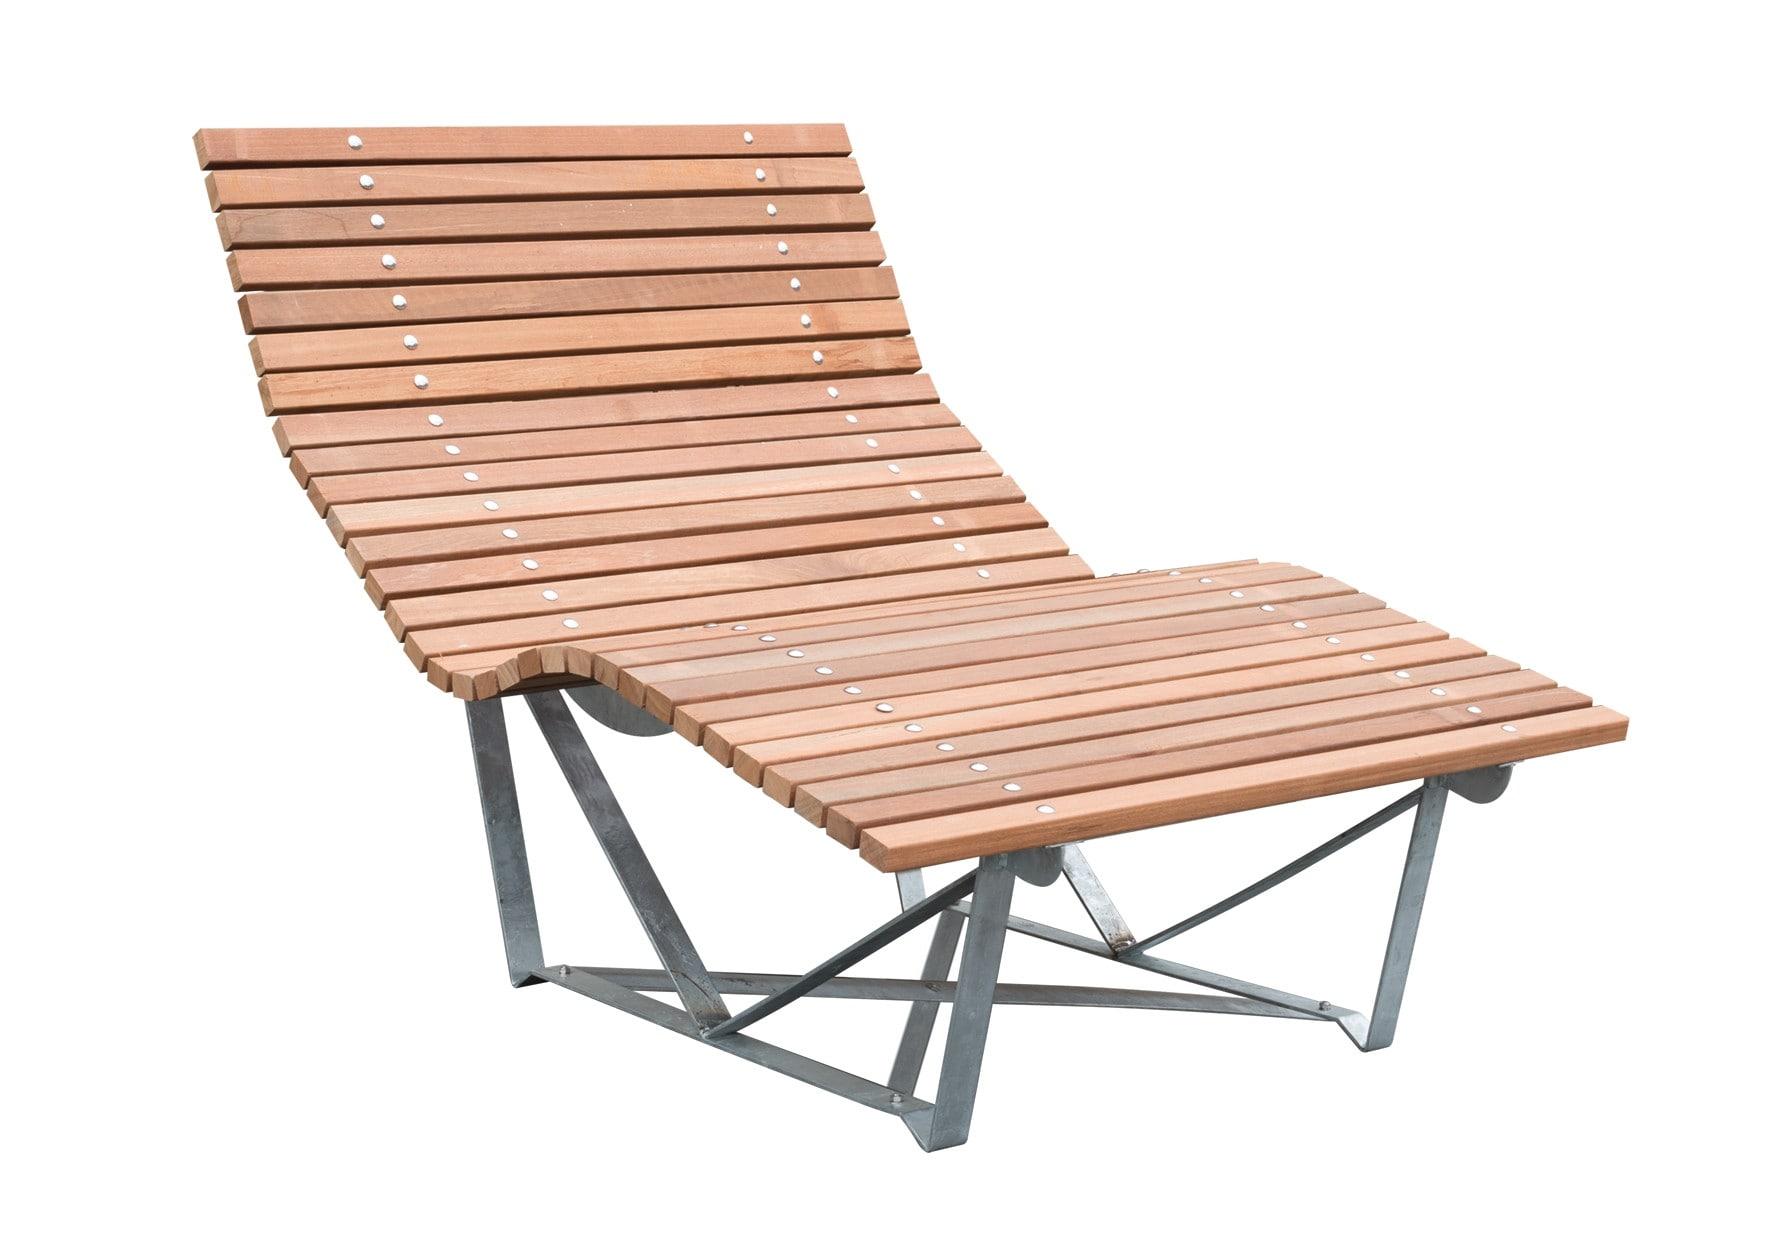 Hardhouten loungestoel carpgarant